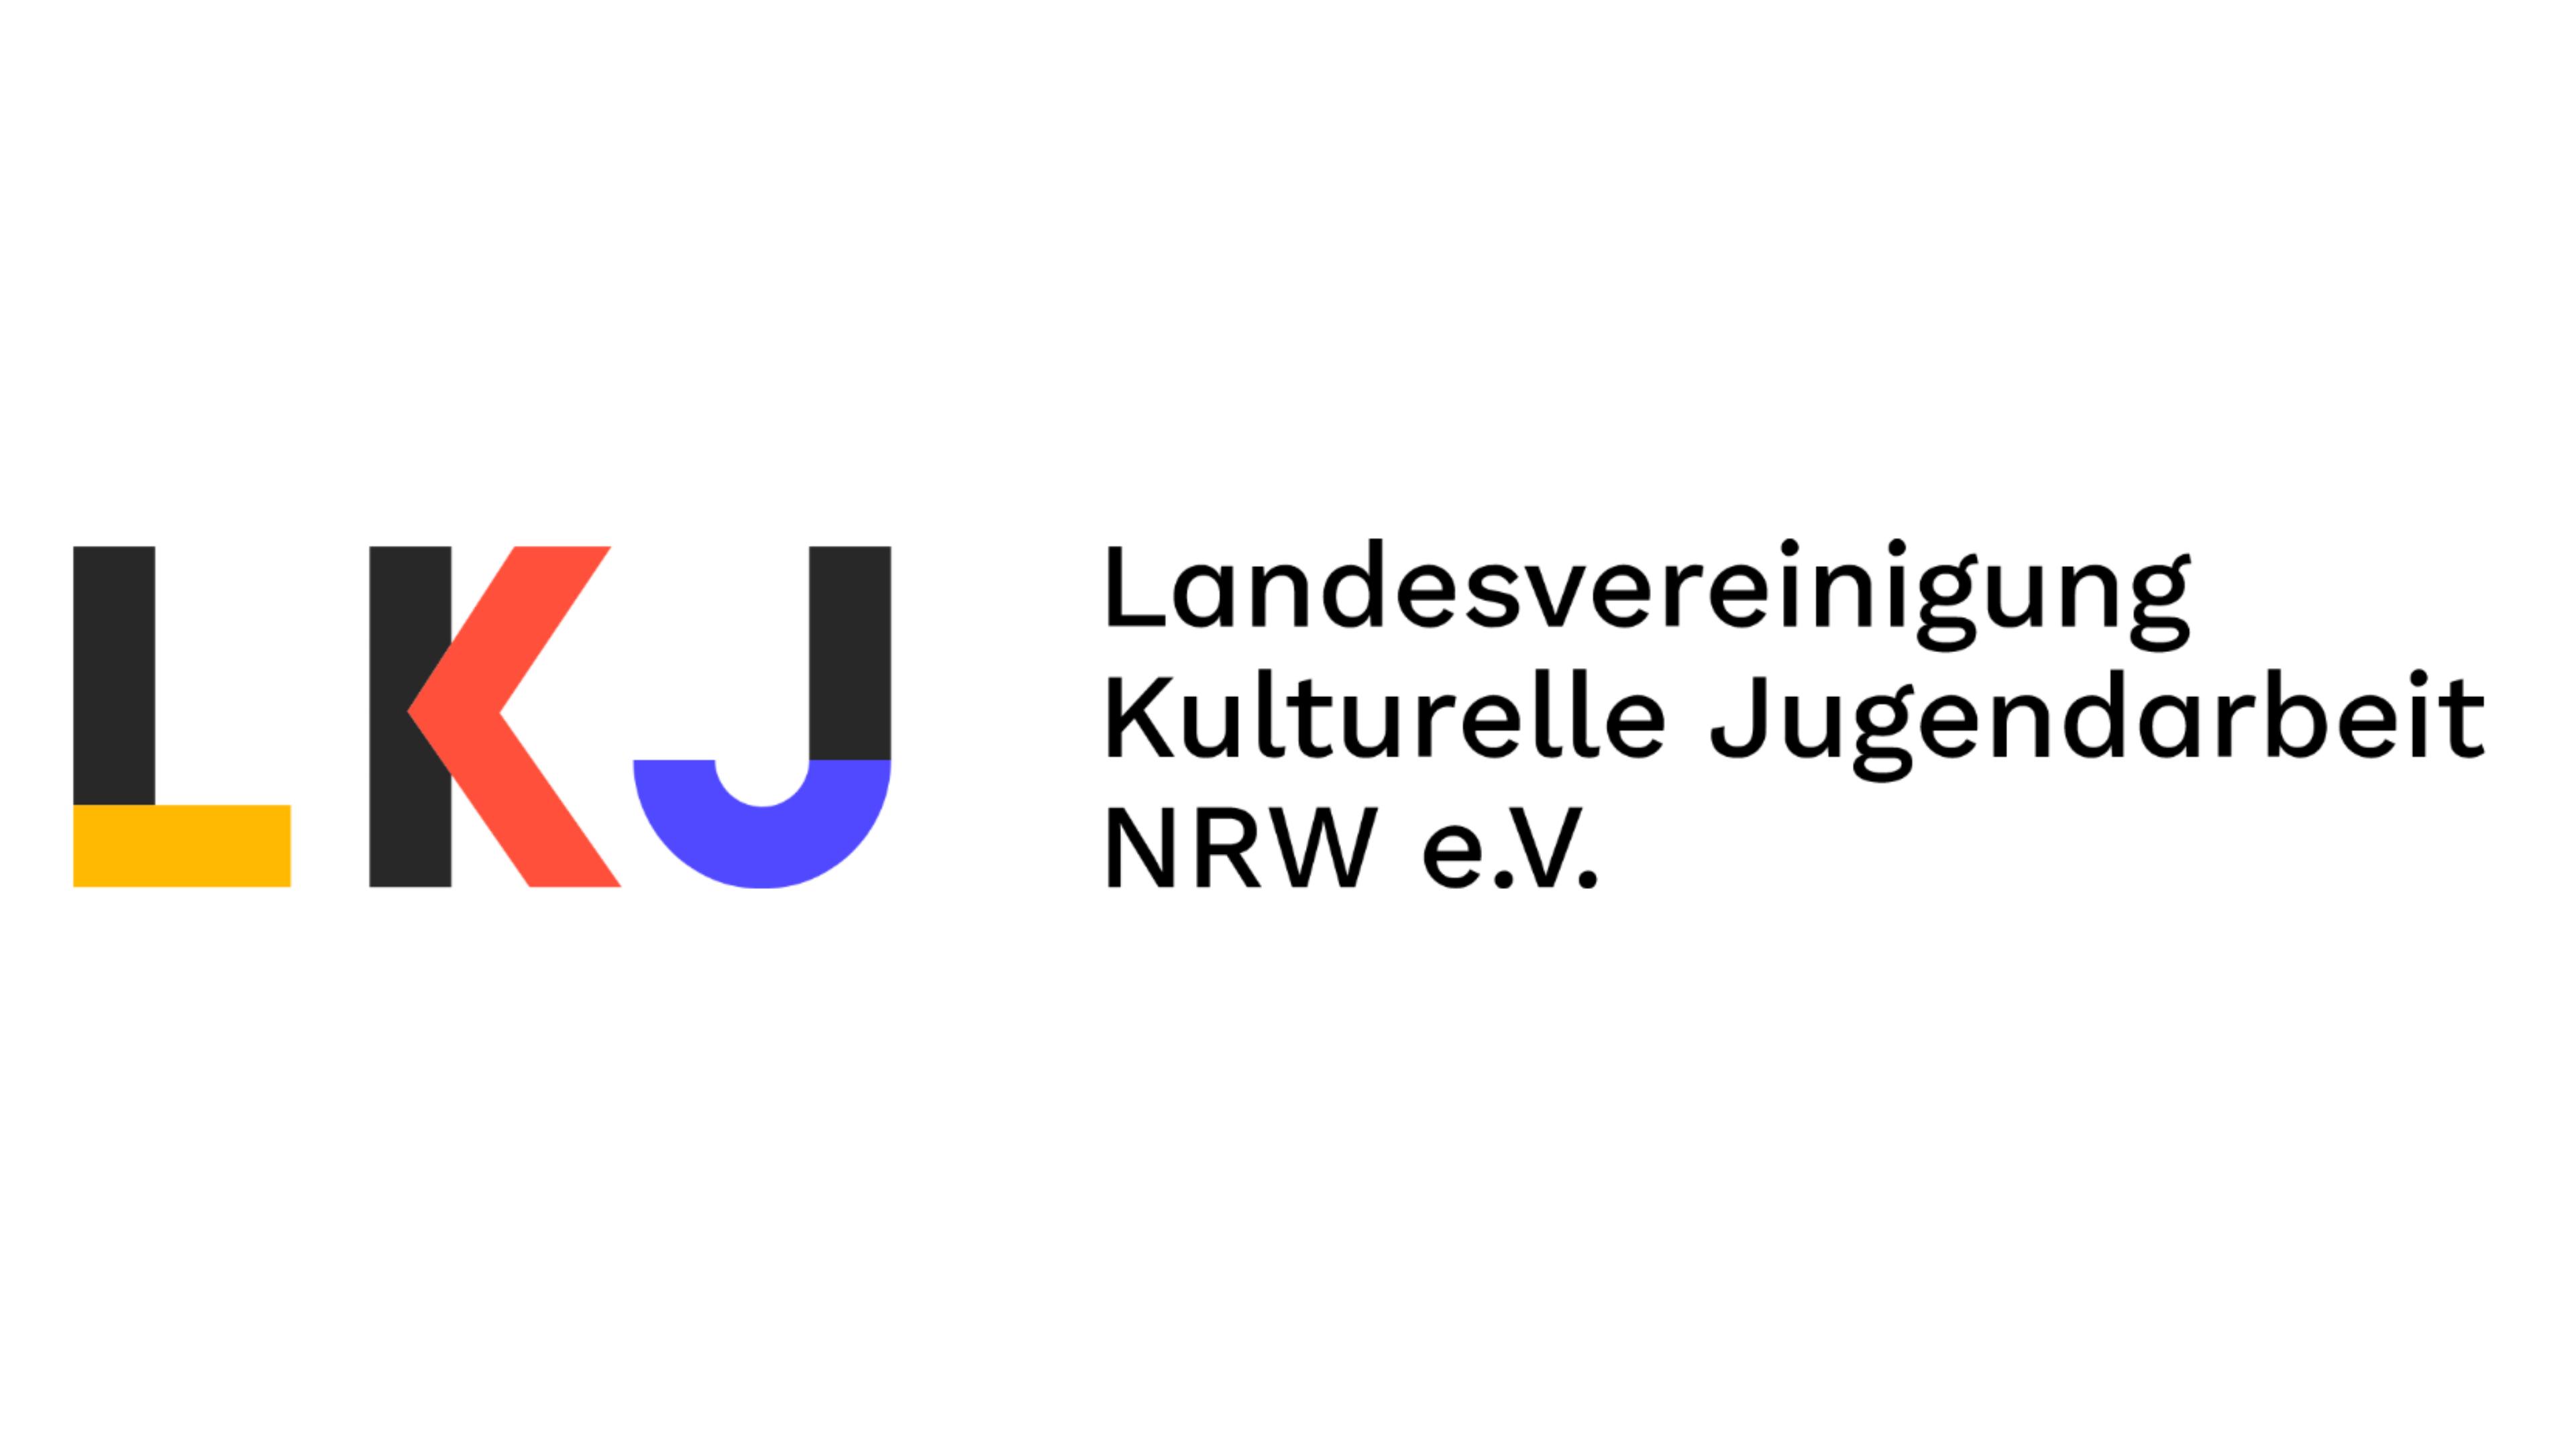 Landesvereinigung Kulturelle Jugendarbeit NRW e.V.